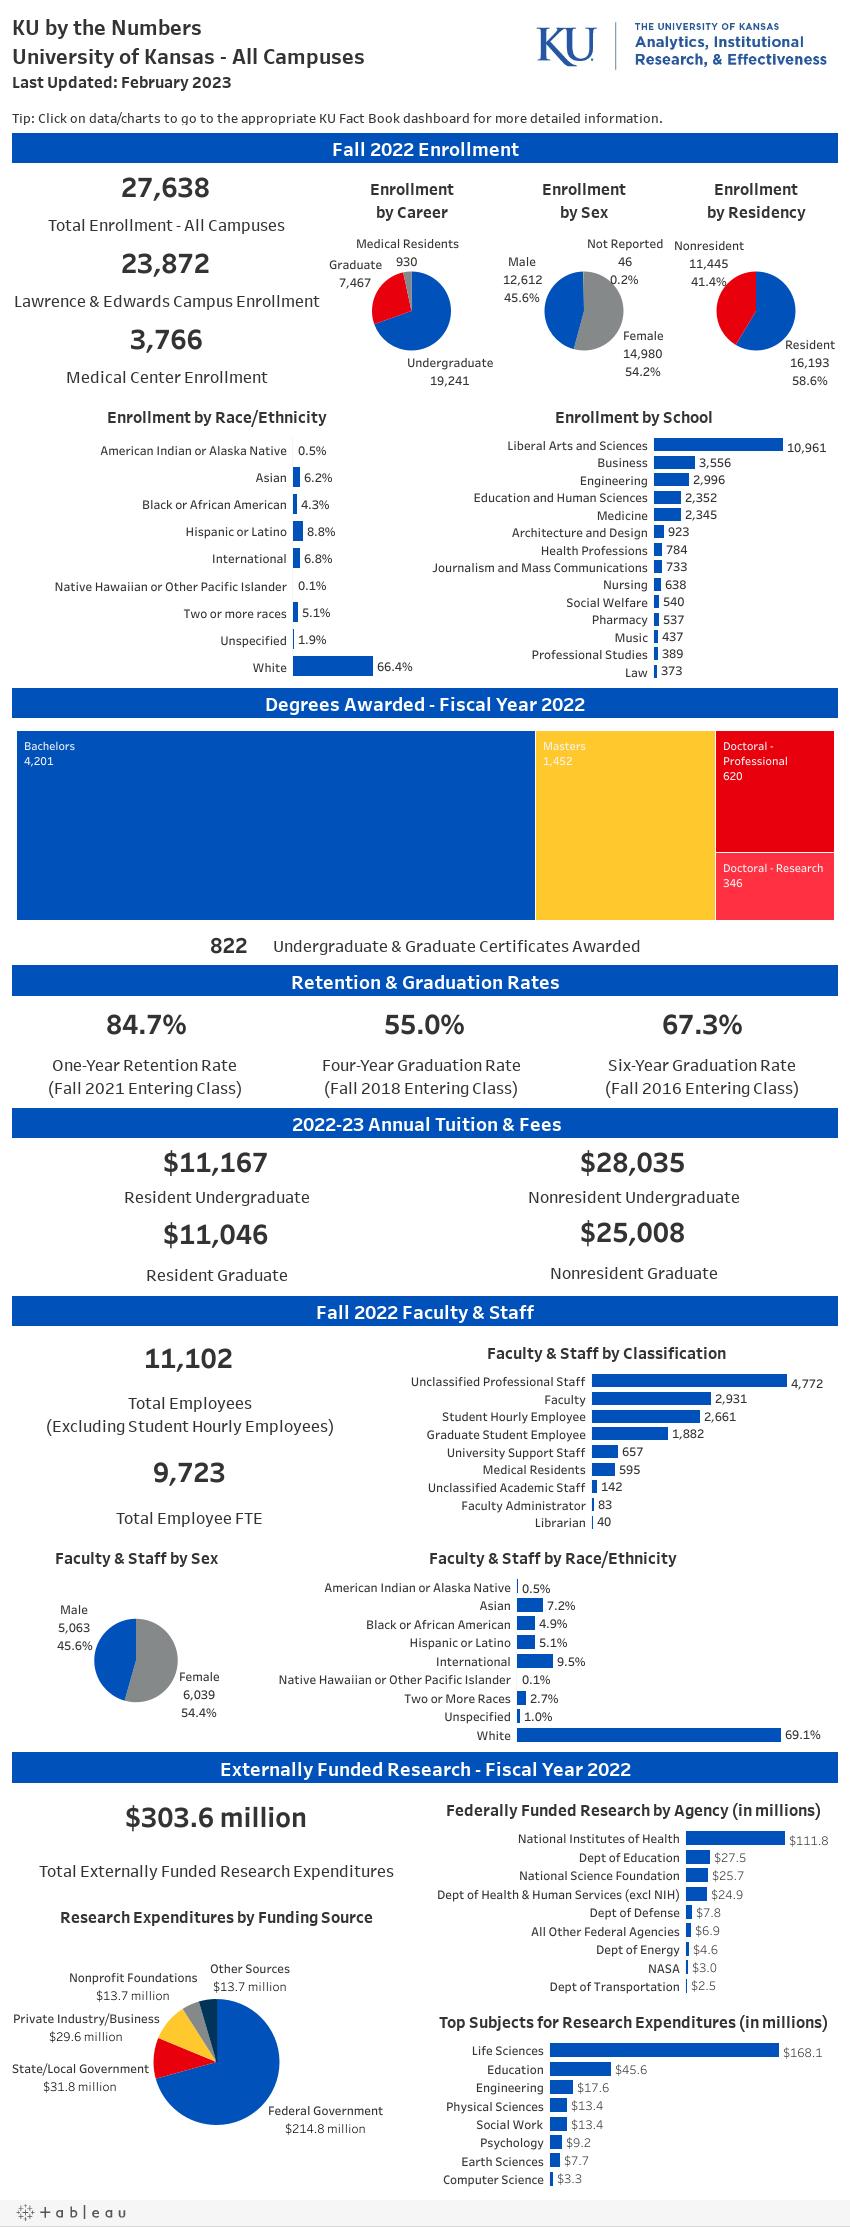 KU by the Numbers